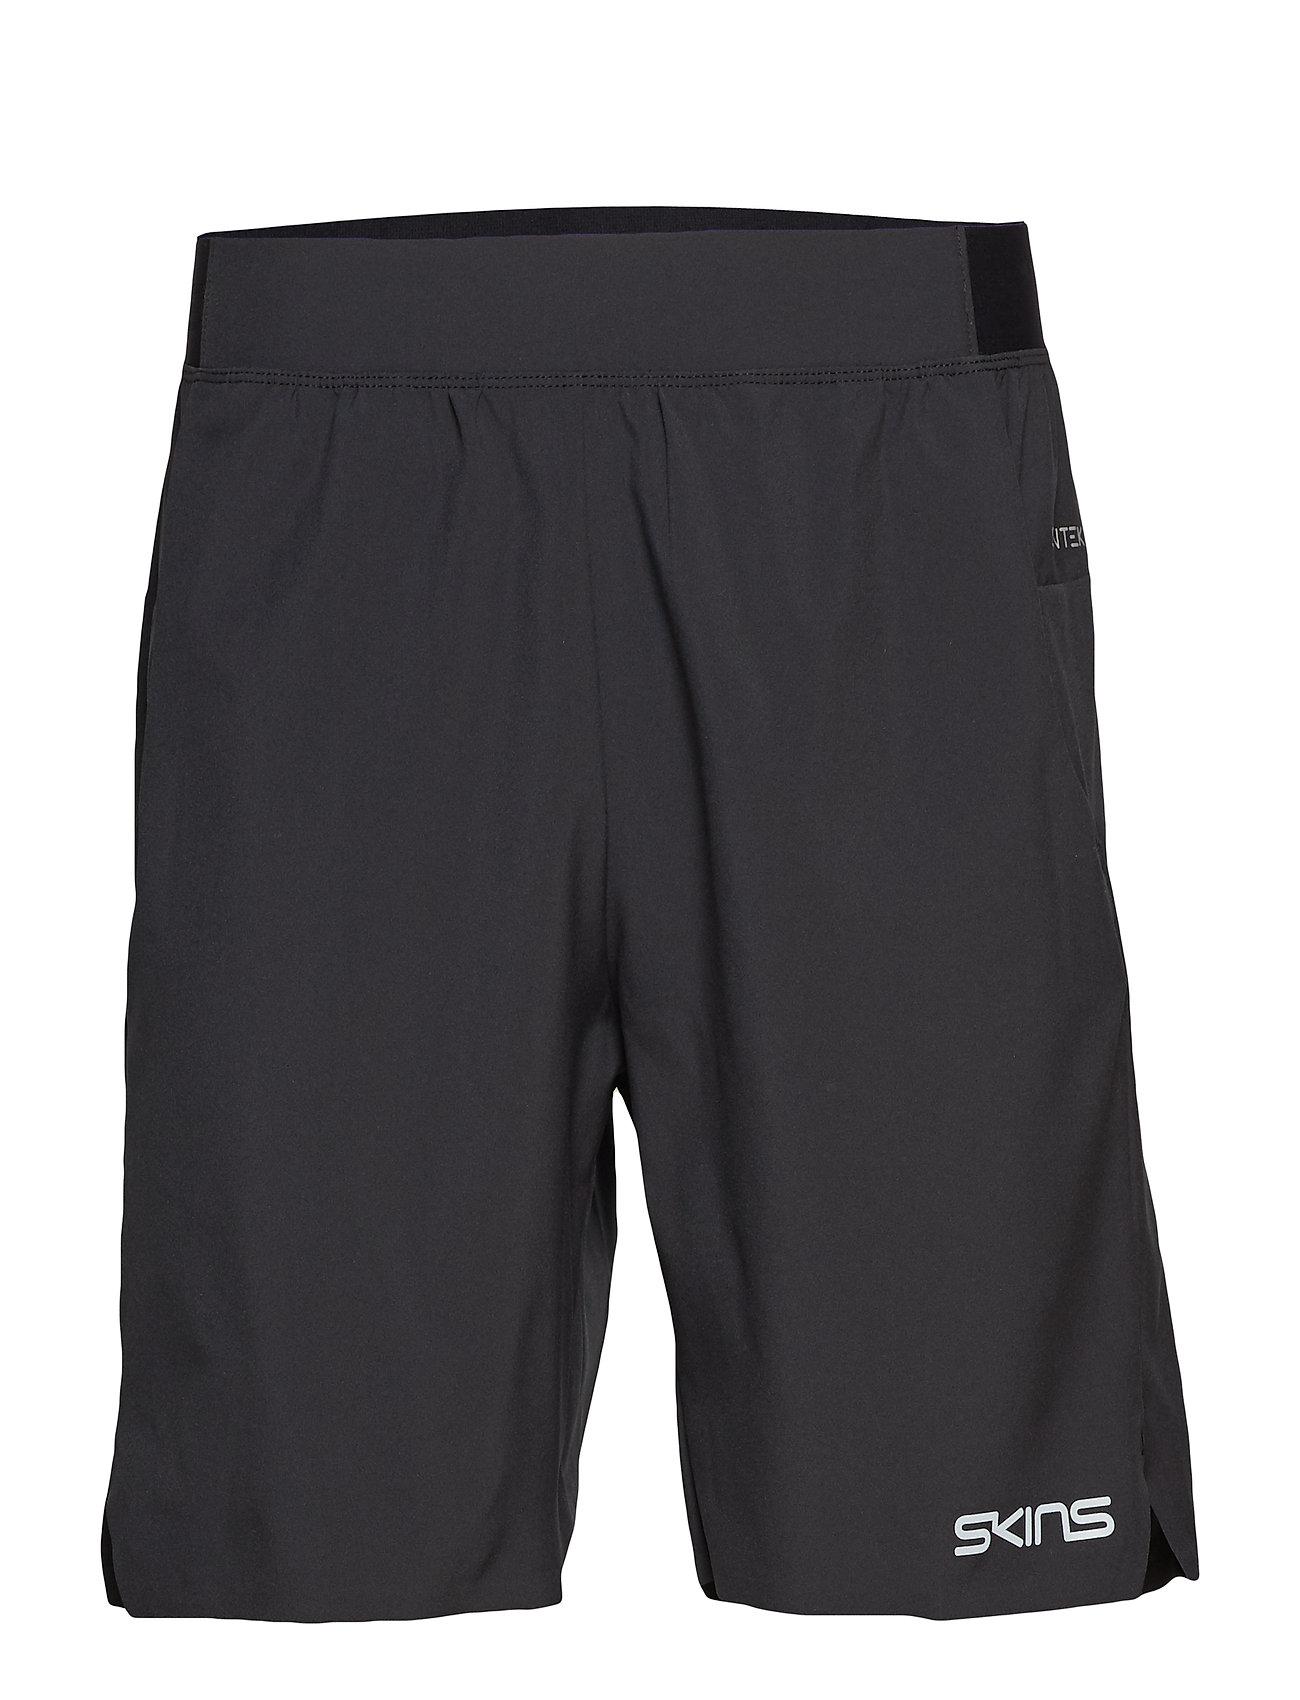 Skins Activewear Nore Mens Shorts 8 - BLACK